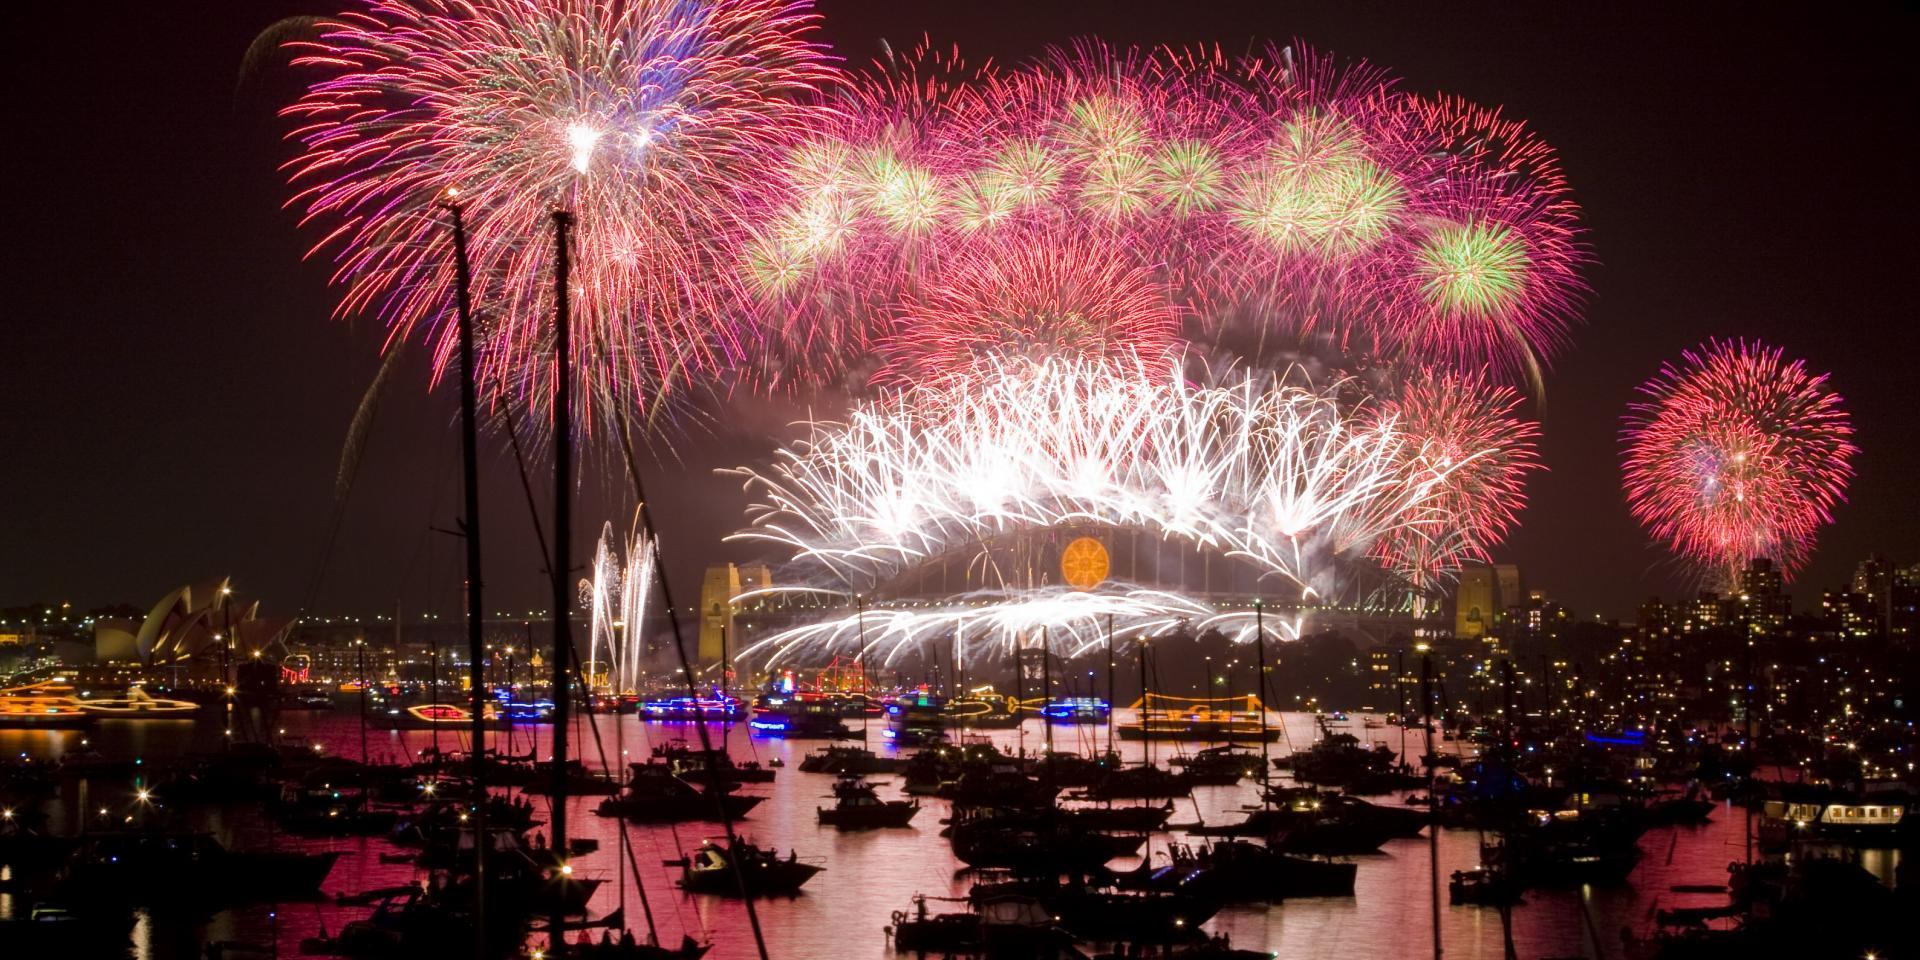 ᐅ Silvester In Sydney 2019 Sydnye So Plant Ihr Den Jahreswechsel